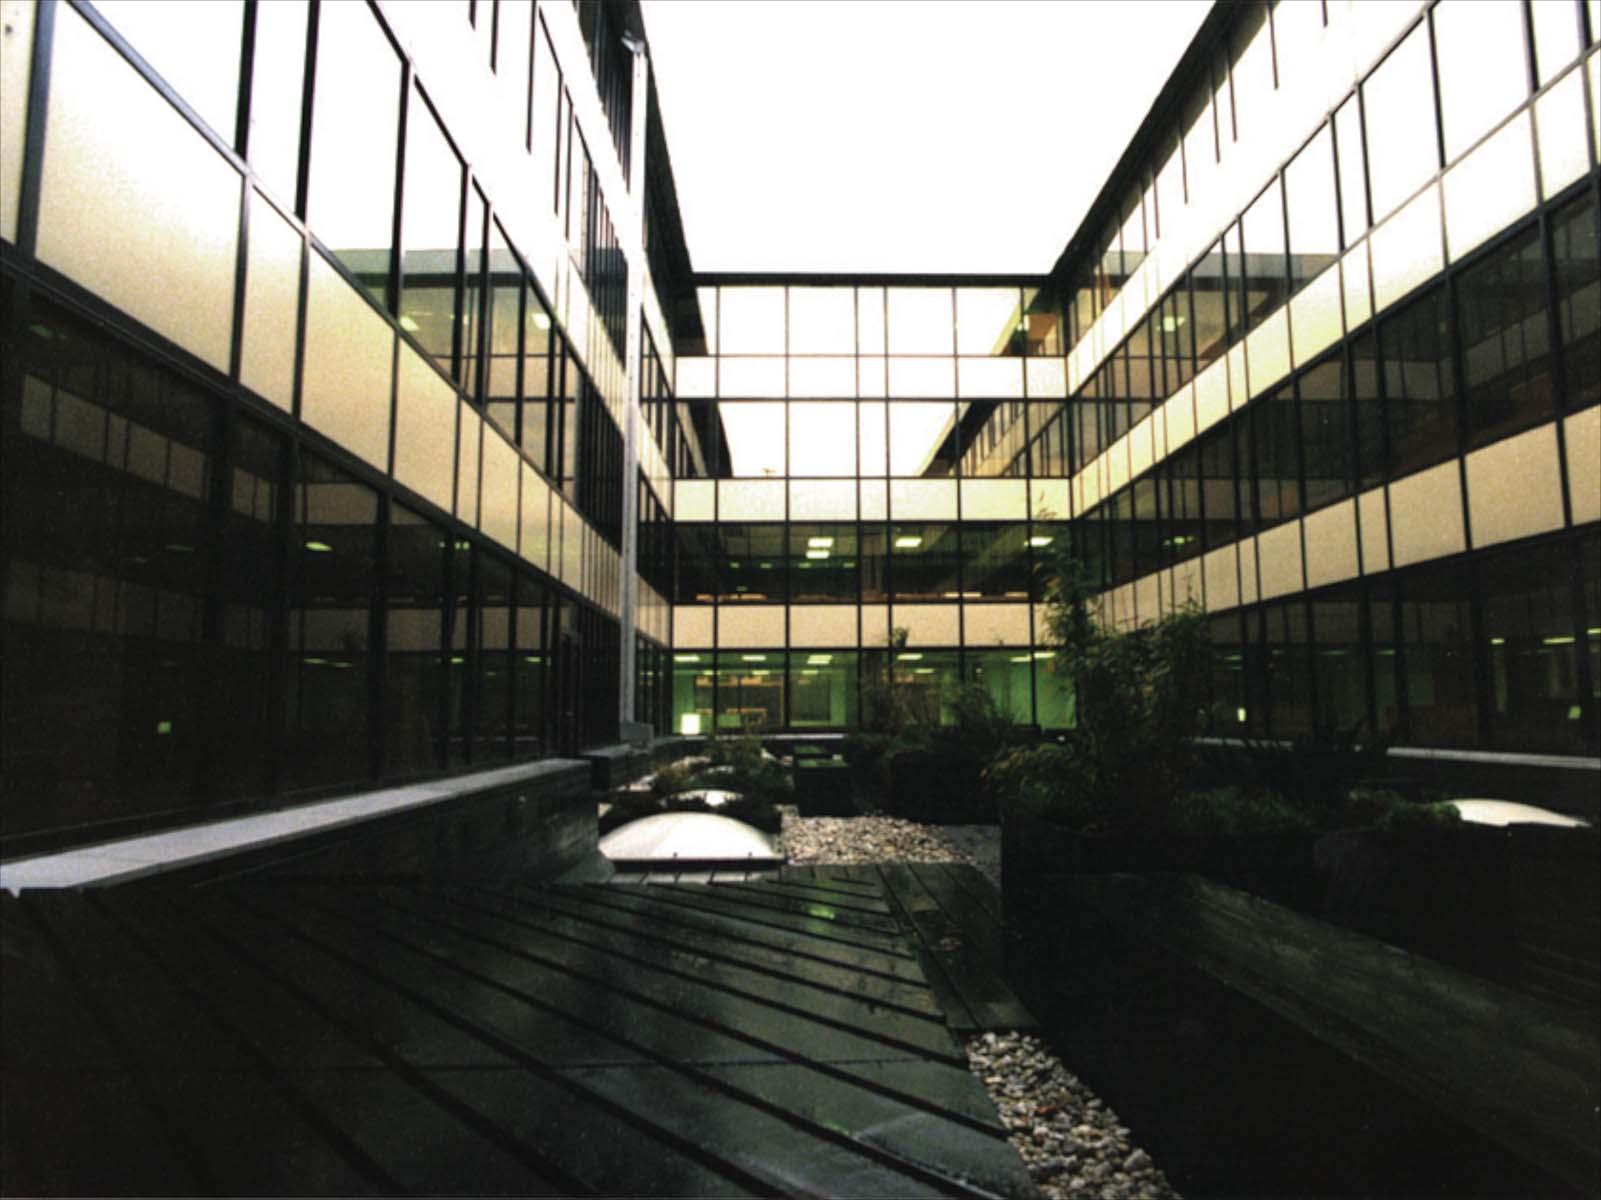 Binnentuin, Den Haag